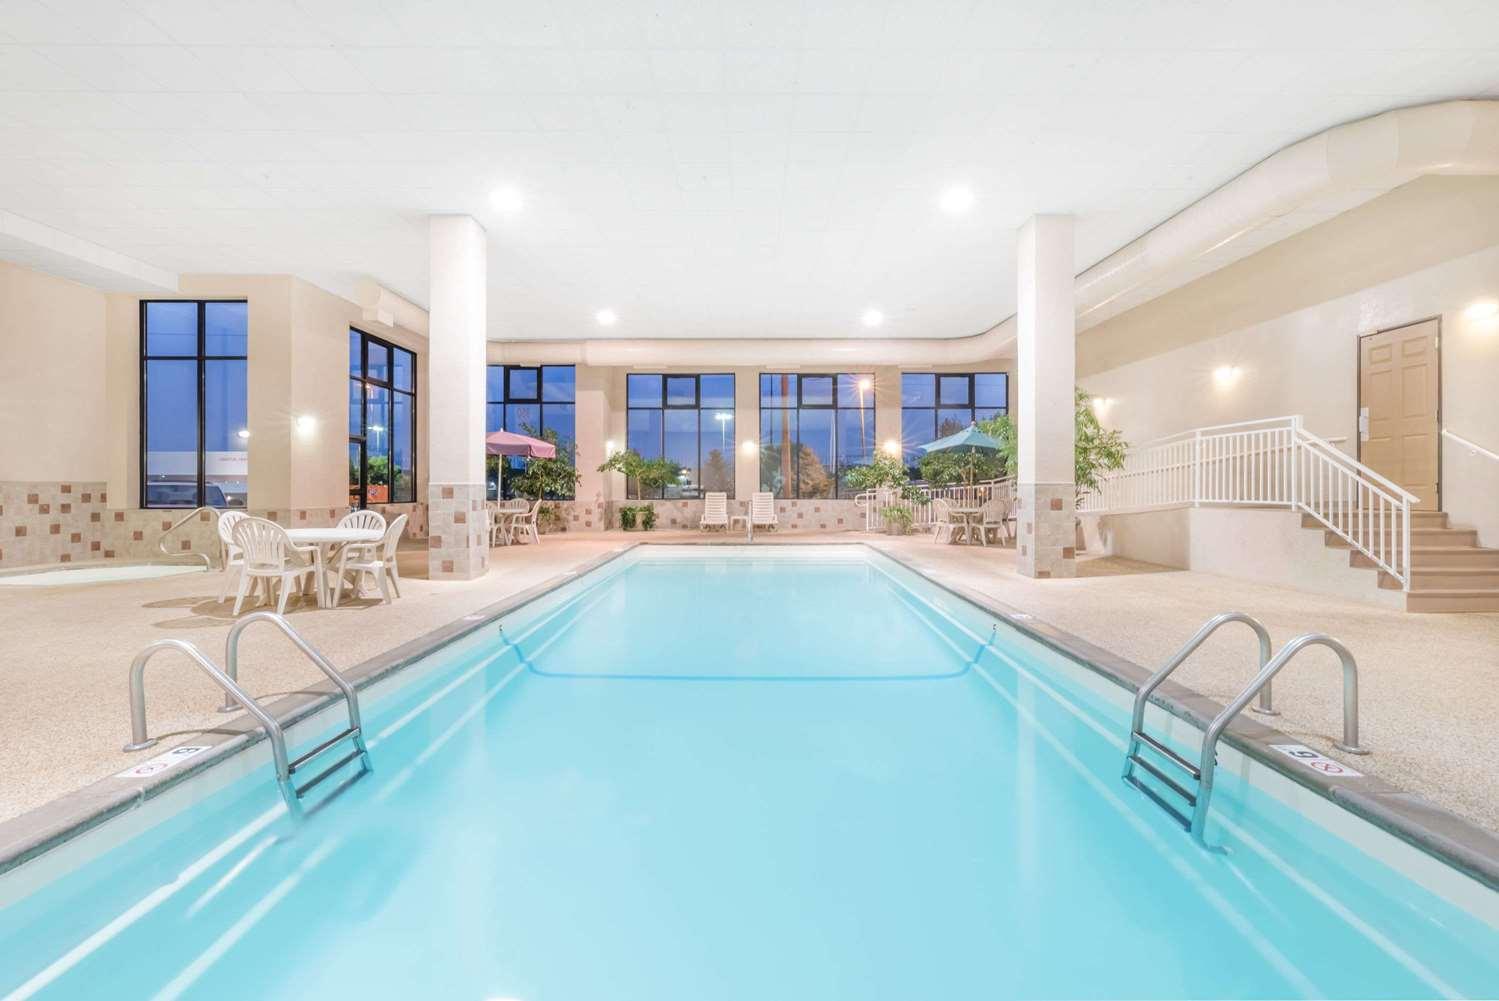 Pool - Howard Johnson Express Inn Rapid City